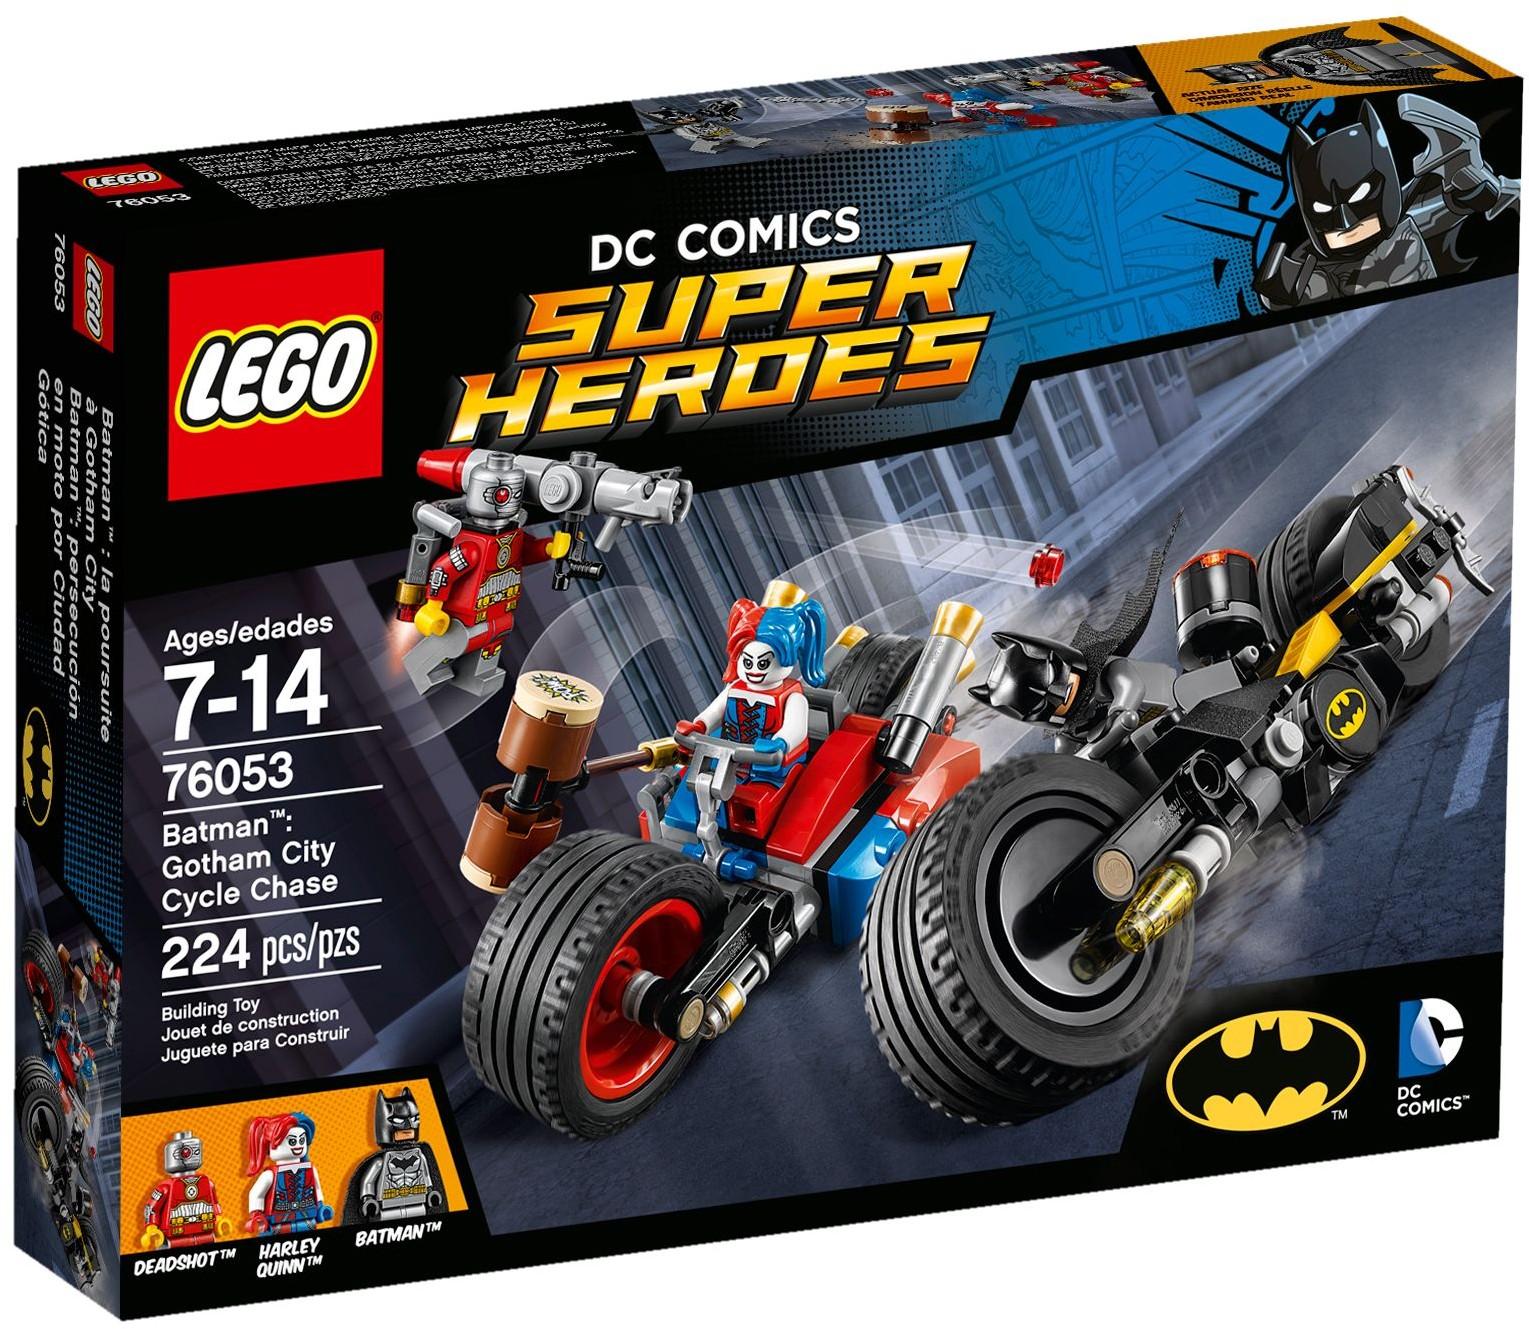 LEGO 76053 DC SUPER HEROES  Batman: Gotham City Cycle Chase